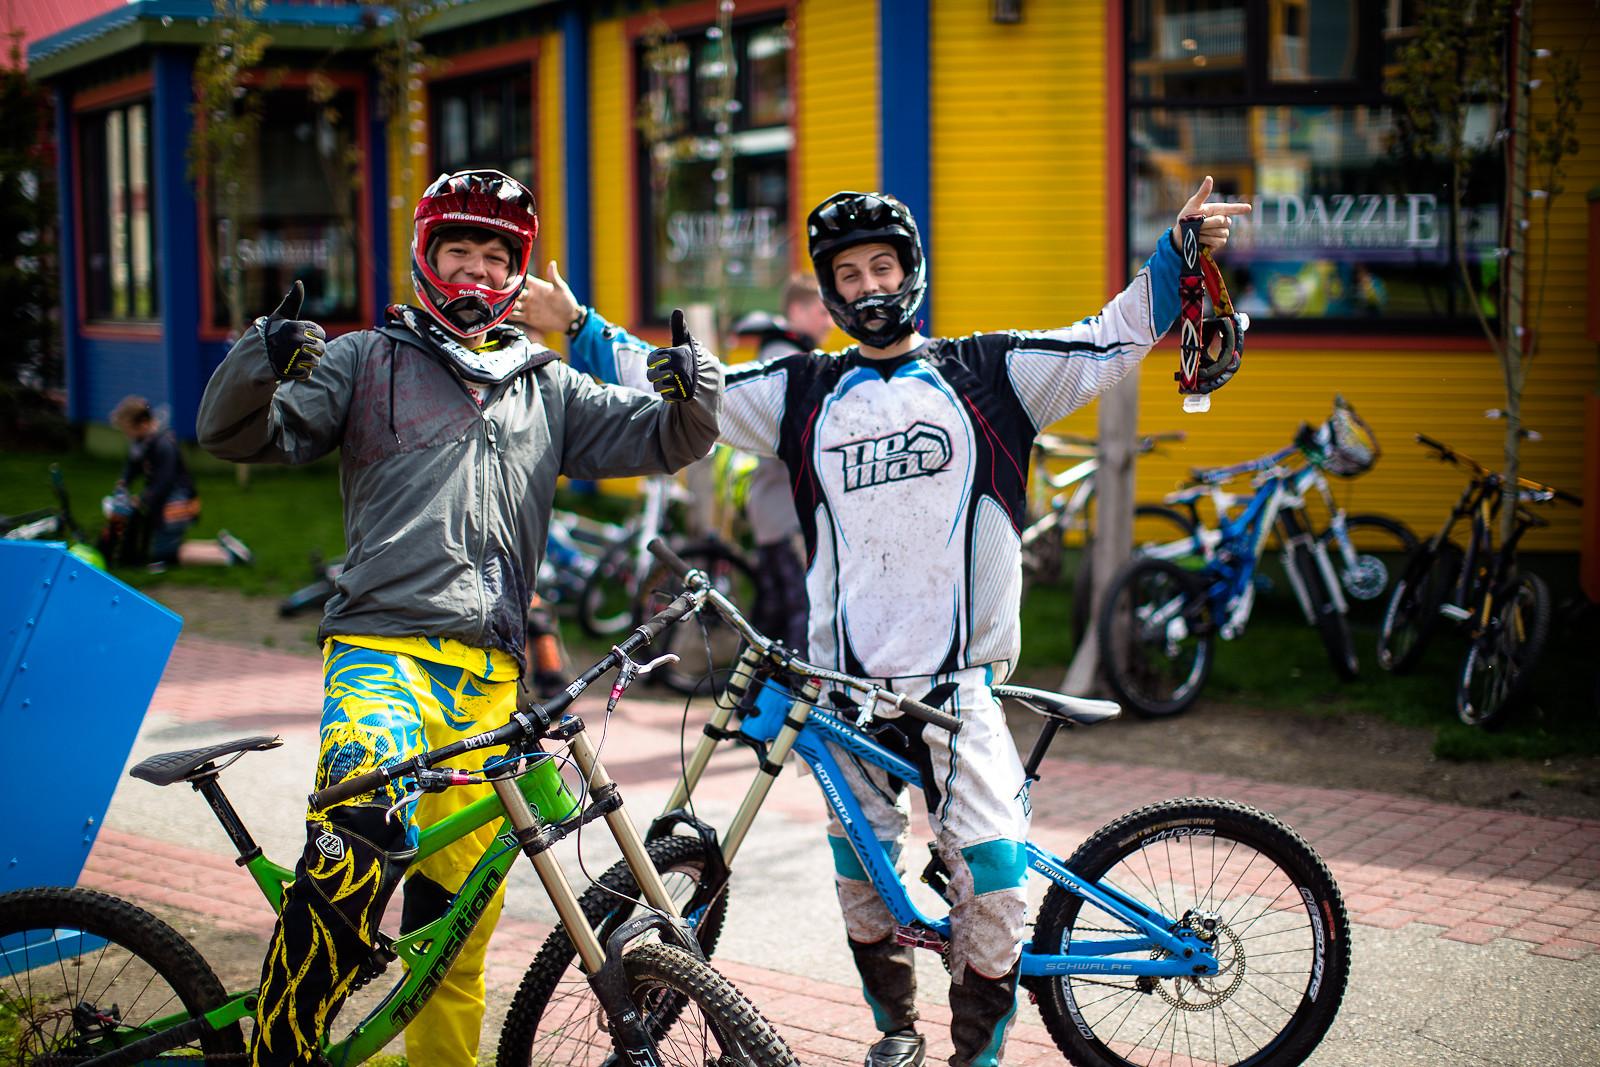 Spencer and Harrison - SilverStarBikePark - Mountain Biking Pictures - Vital MTB